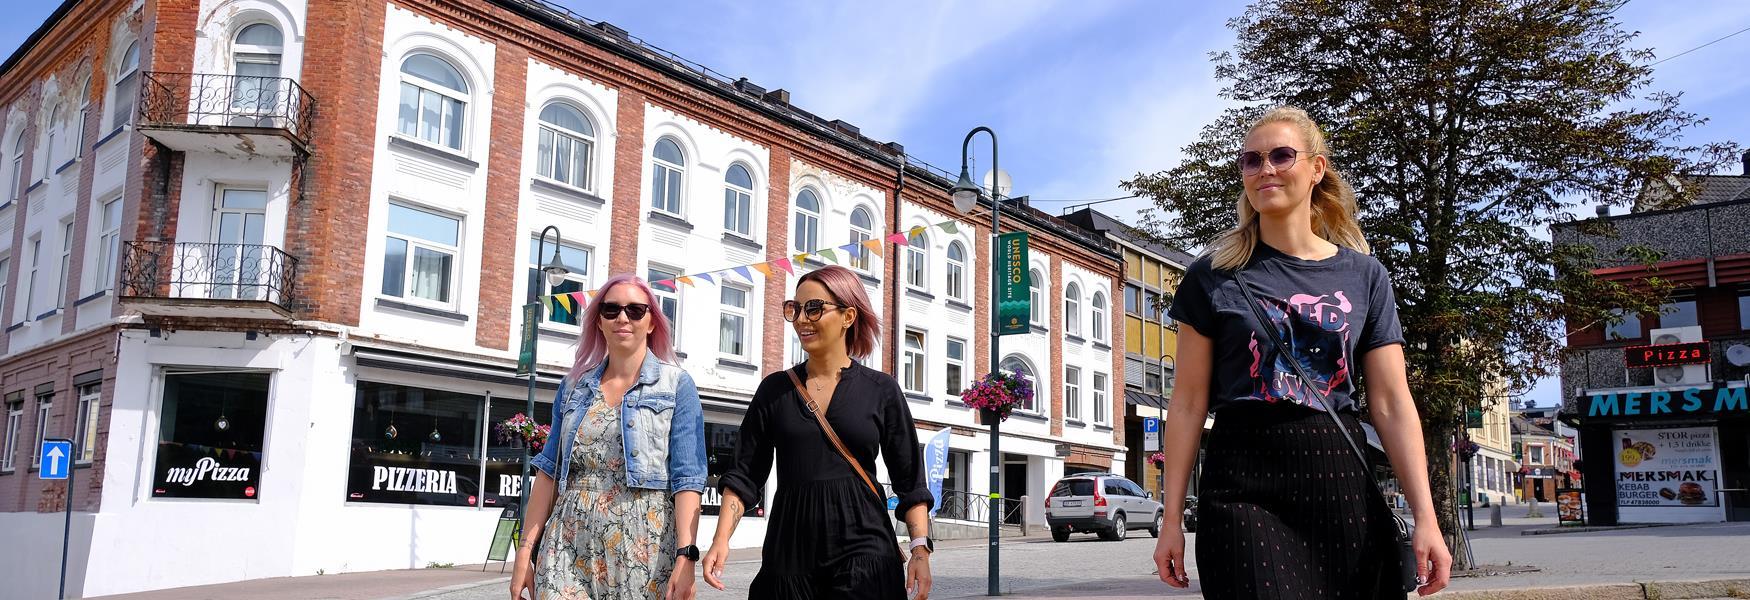 Shopping Notodden